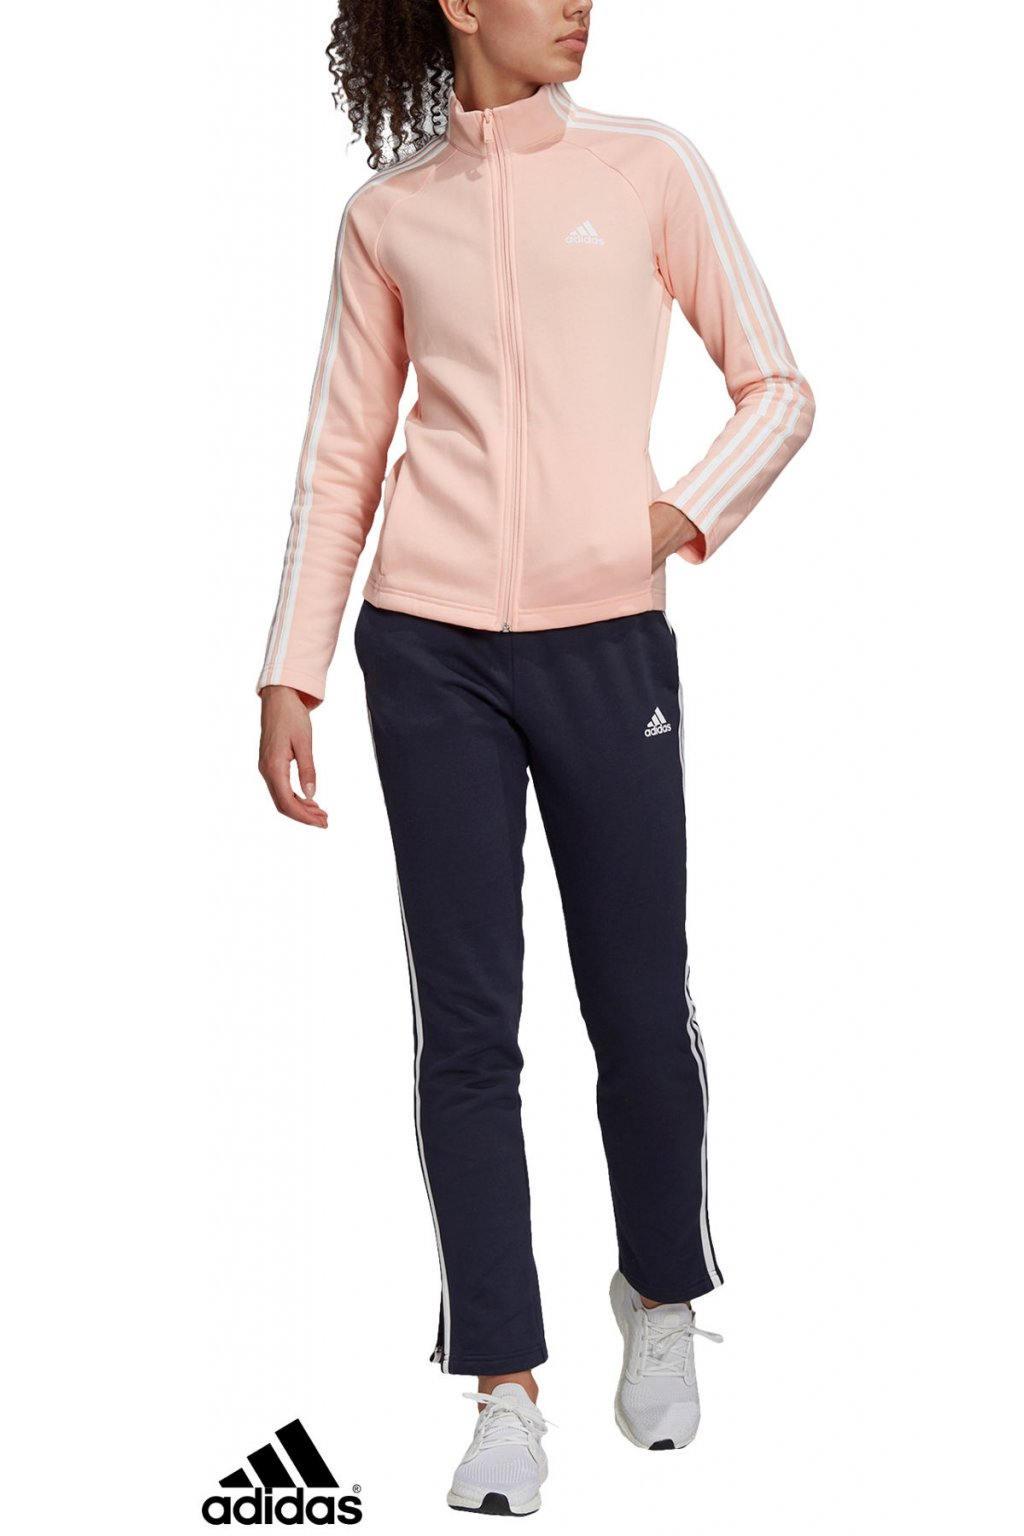 gk2114 damska suprava adidas cotton fleece